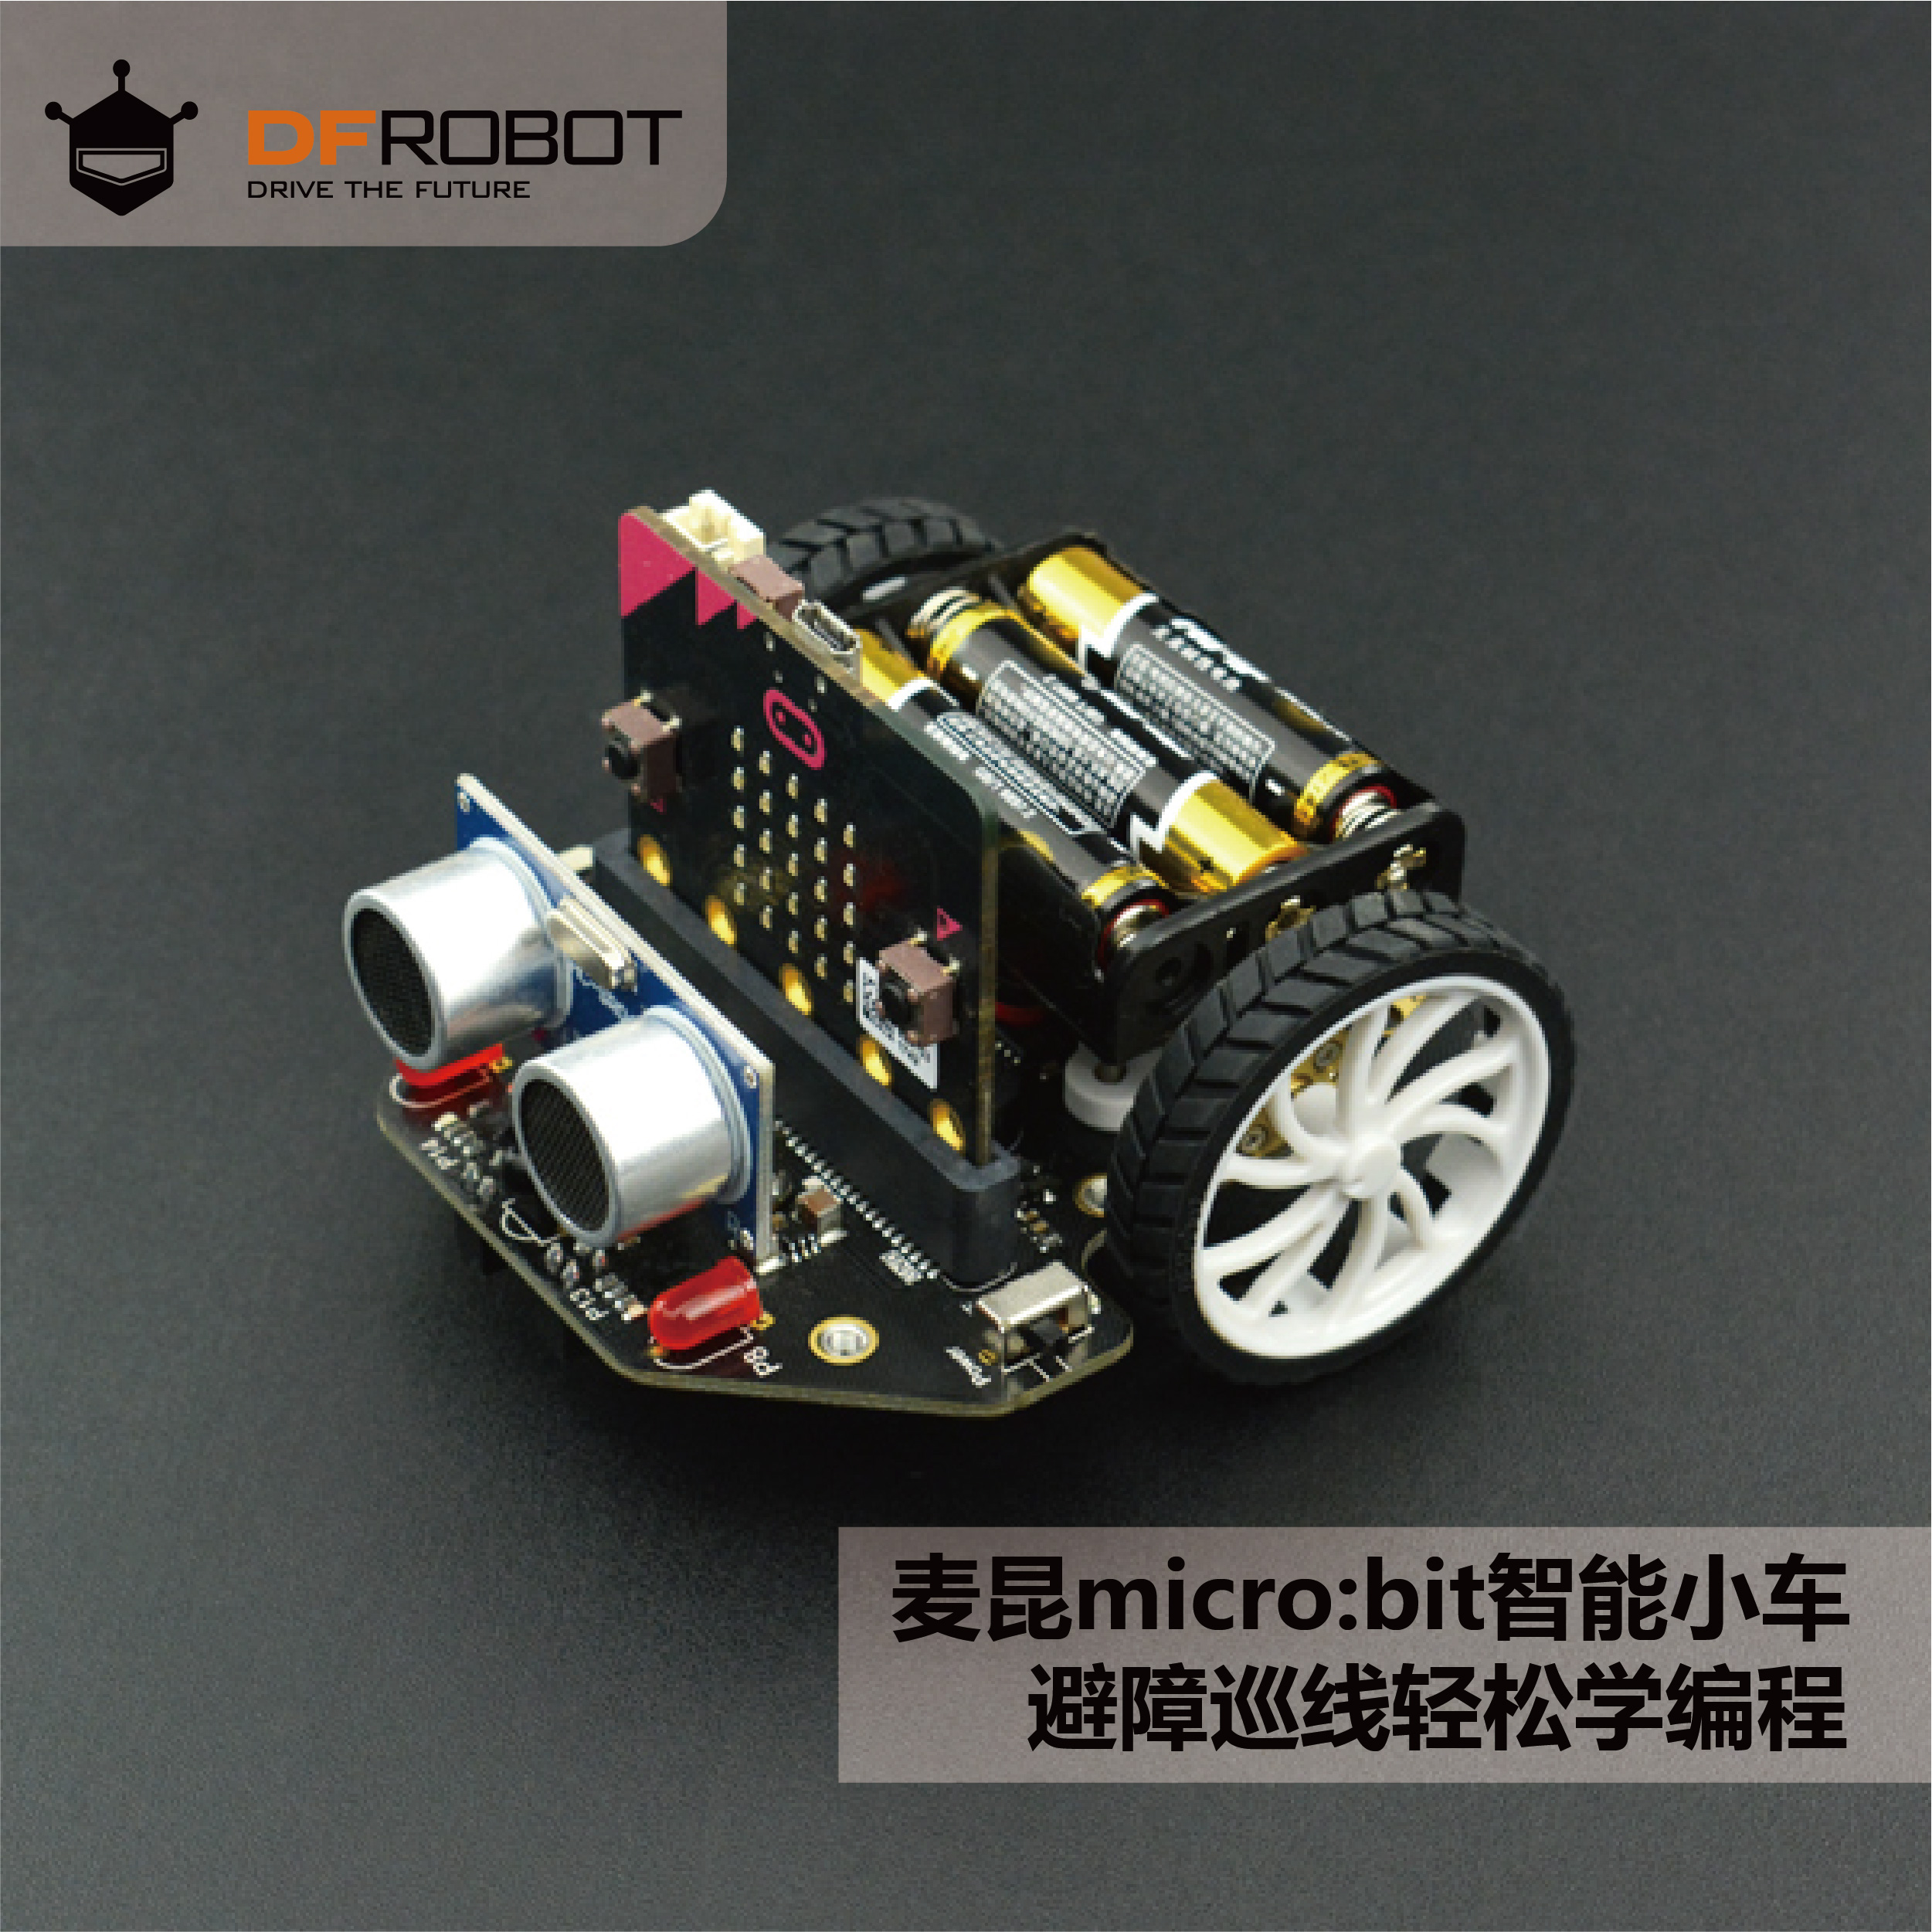 McQueen 4 0scratch programming smart car micro: bit